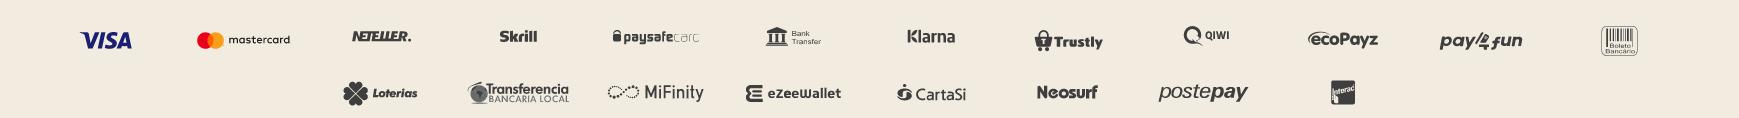 yoyo casino metody płatności screenshot